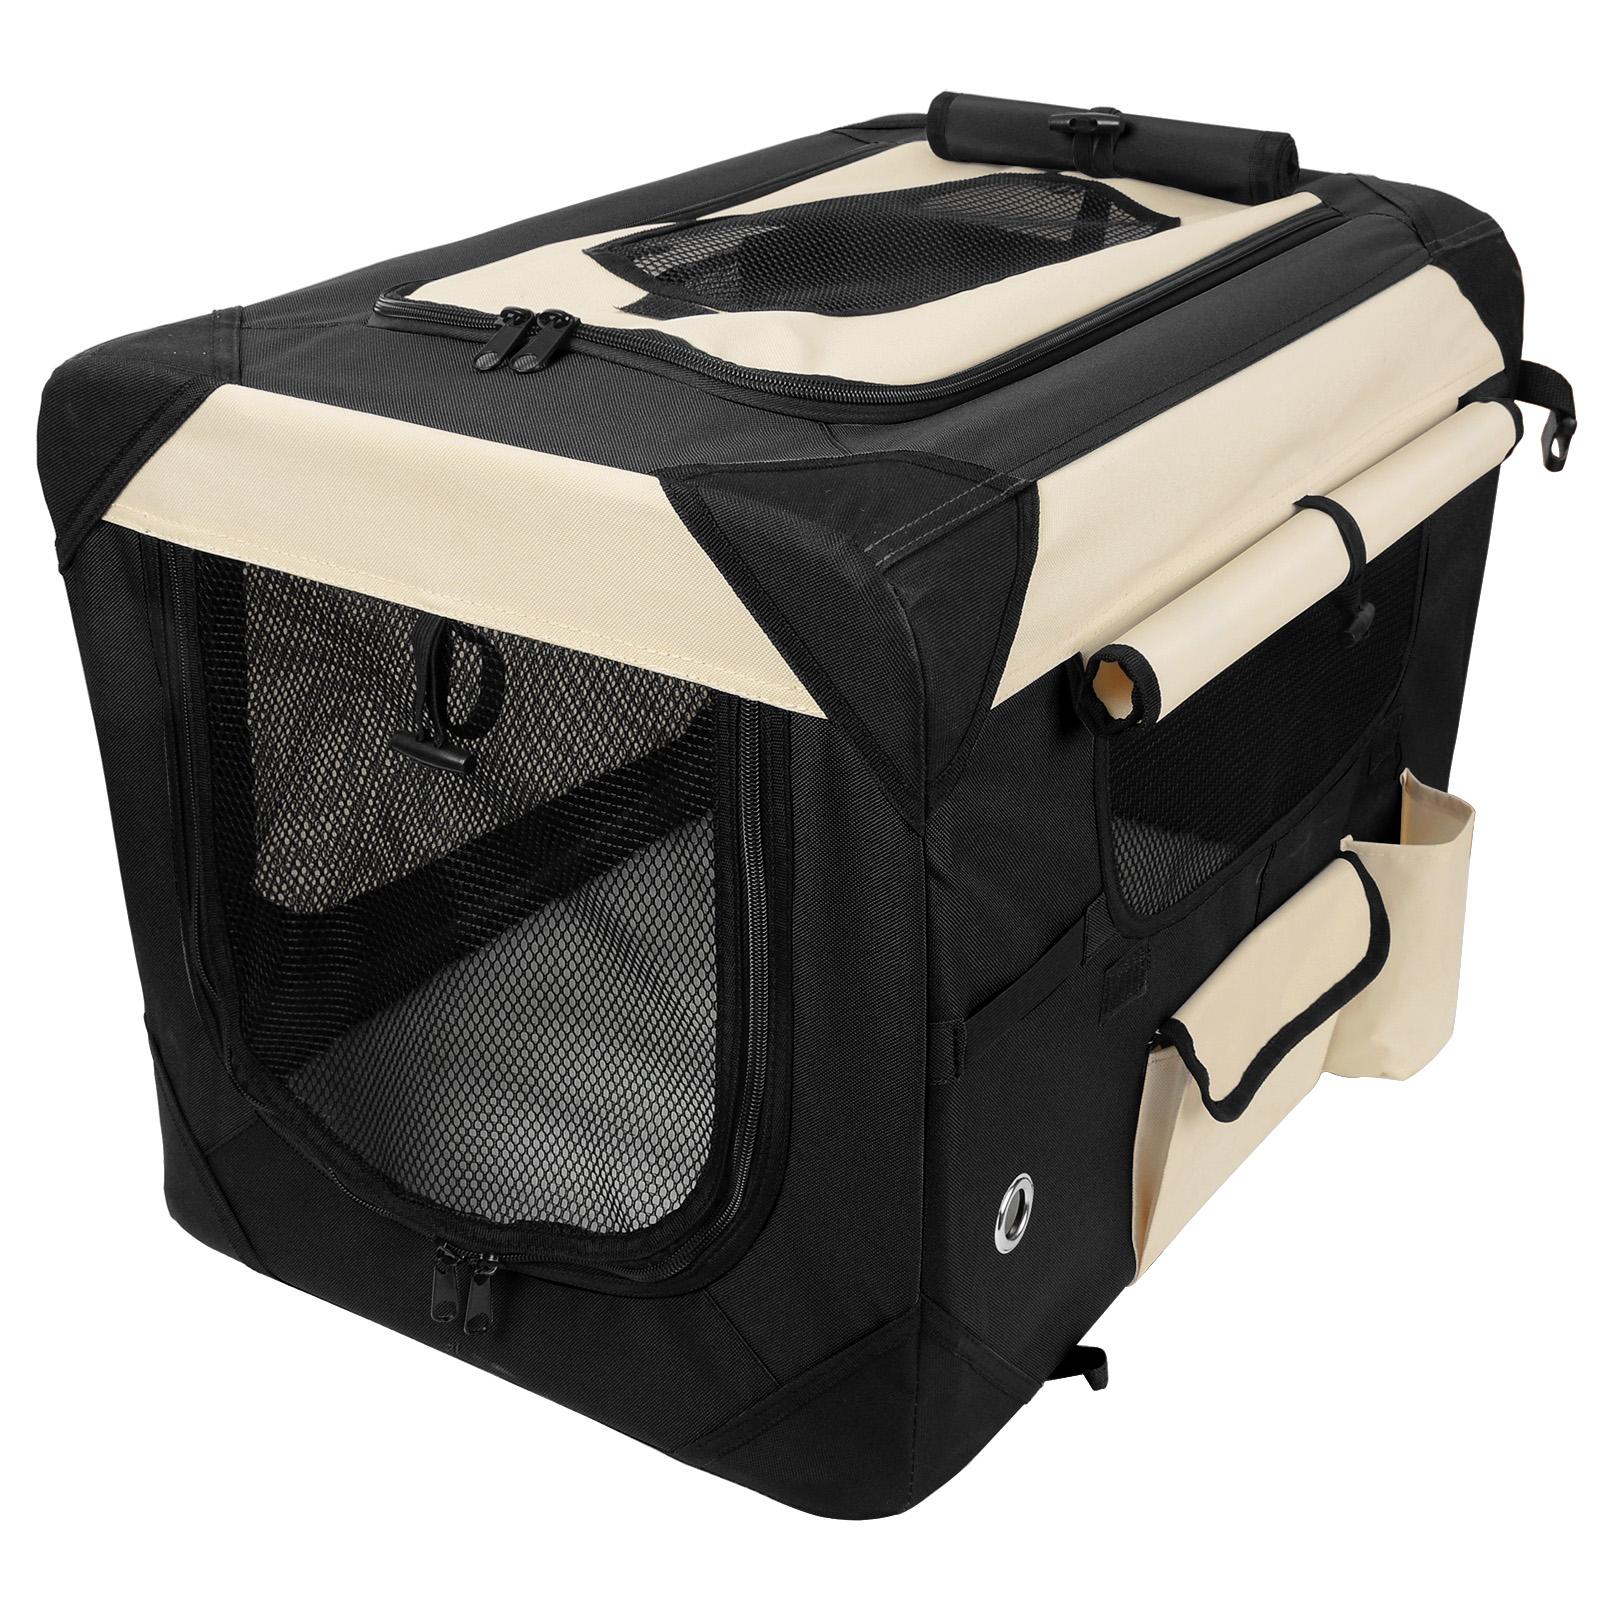 faltbare hundebox transportbox autotransportbox reisebox. Black Bedroom Furniture Sets. Home Design Ideas